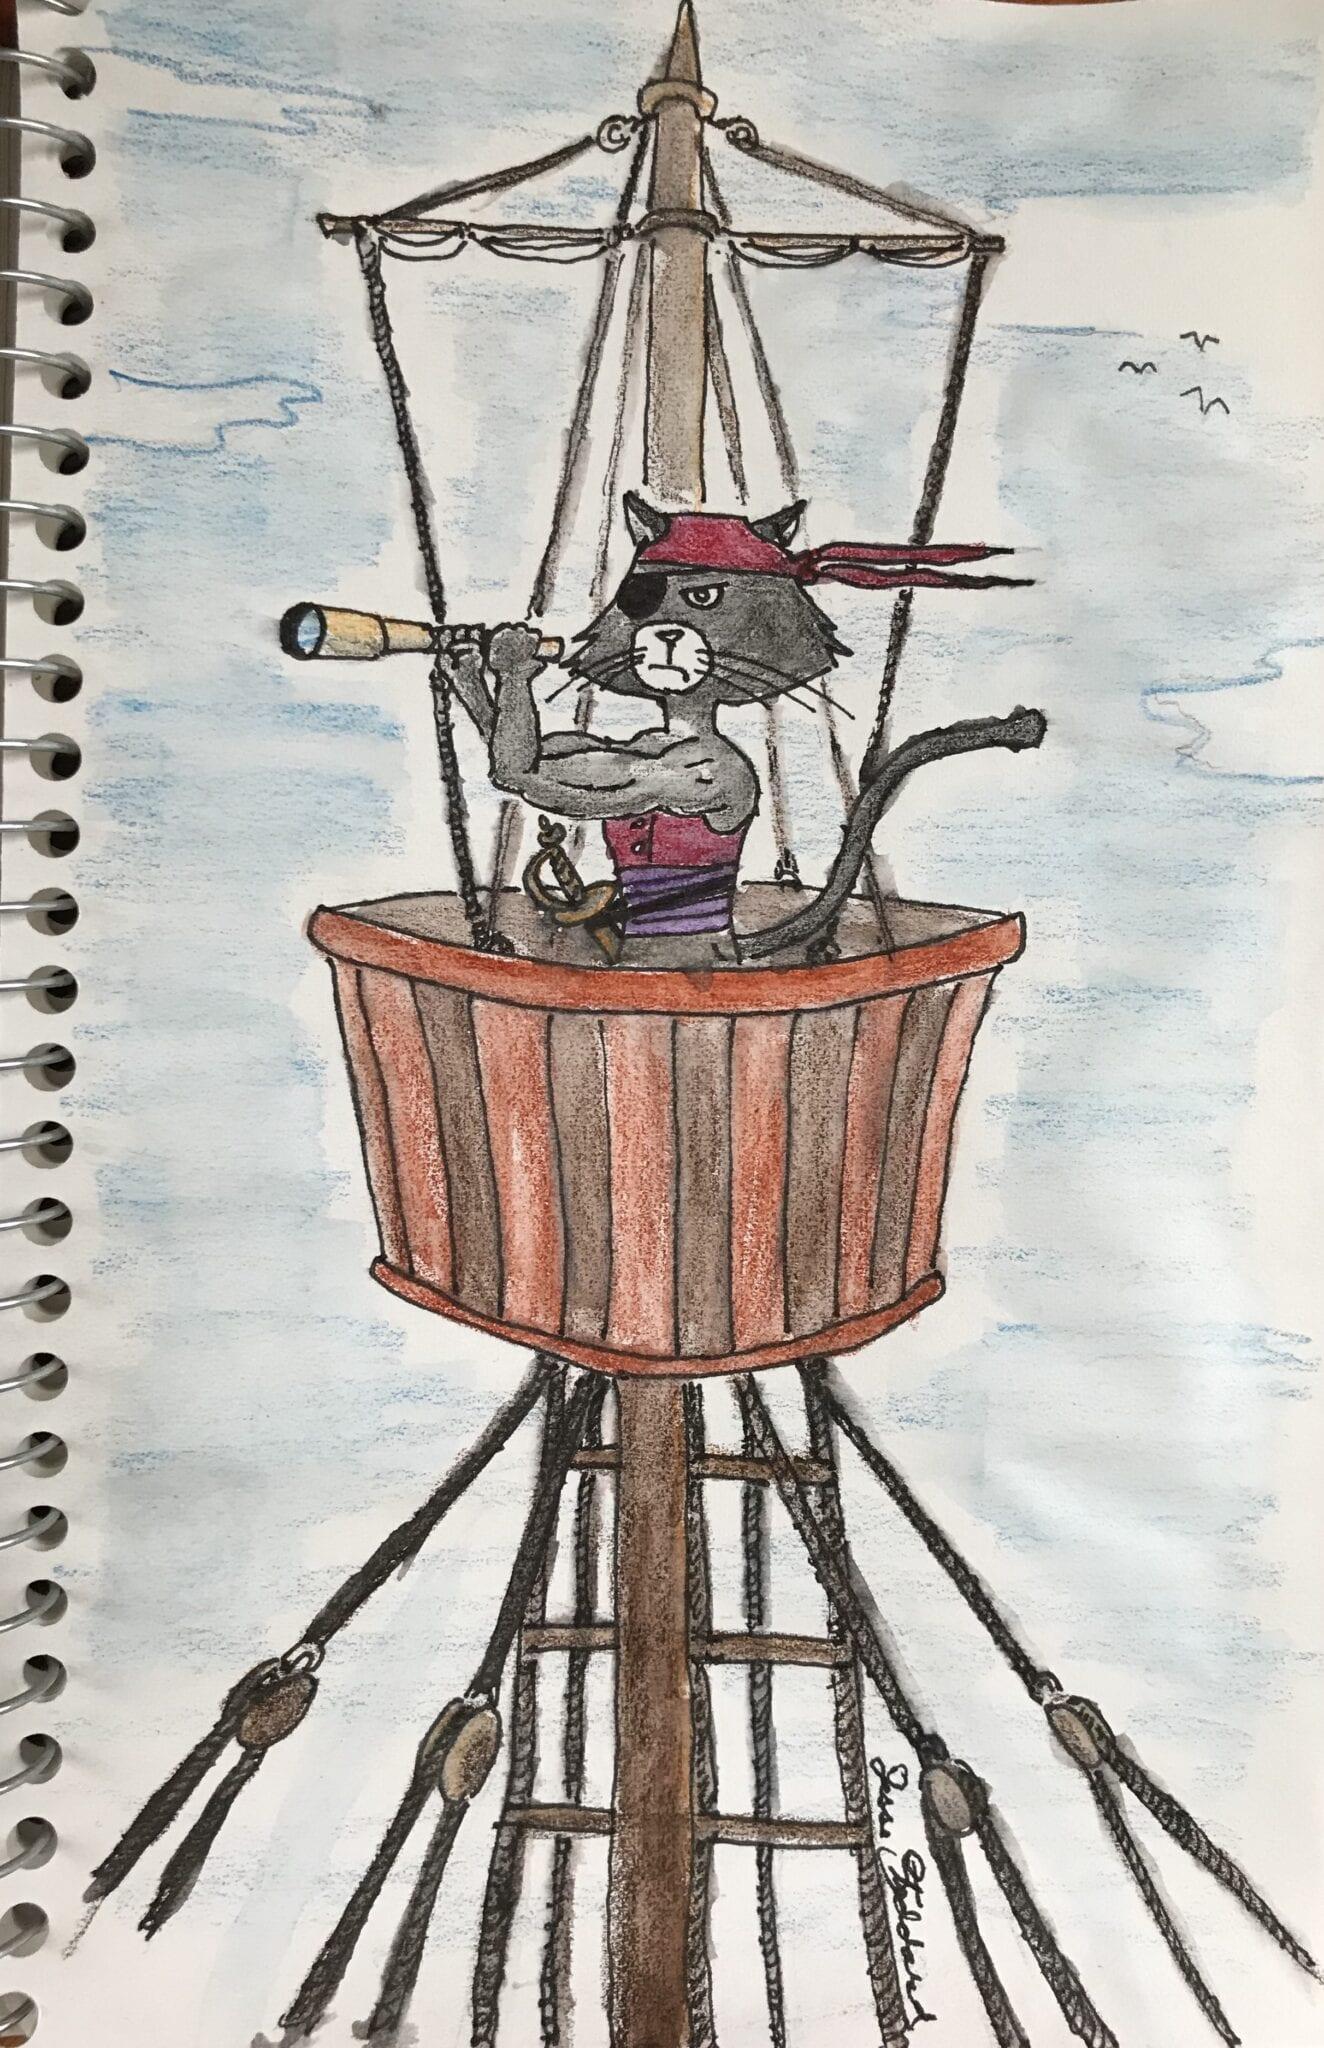 Albert the Cat Pirate